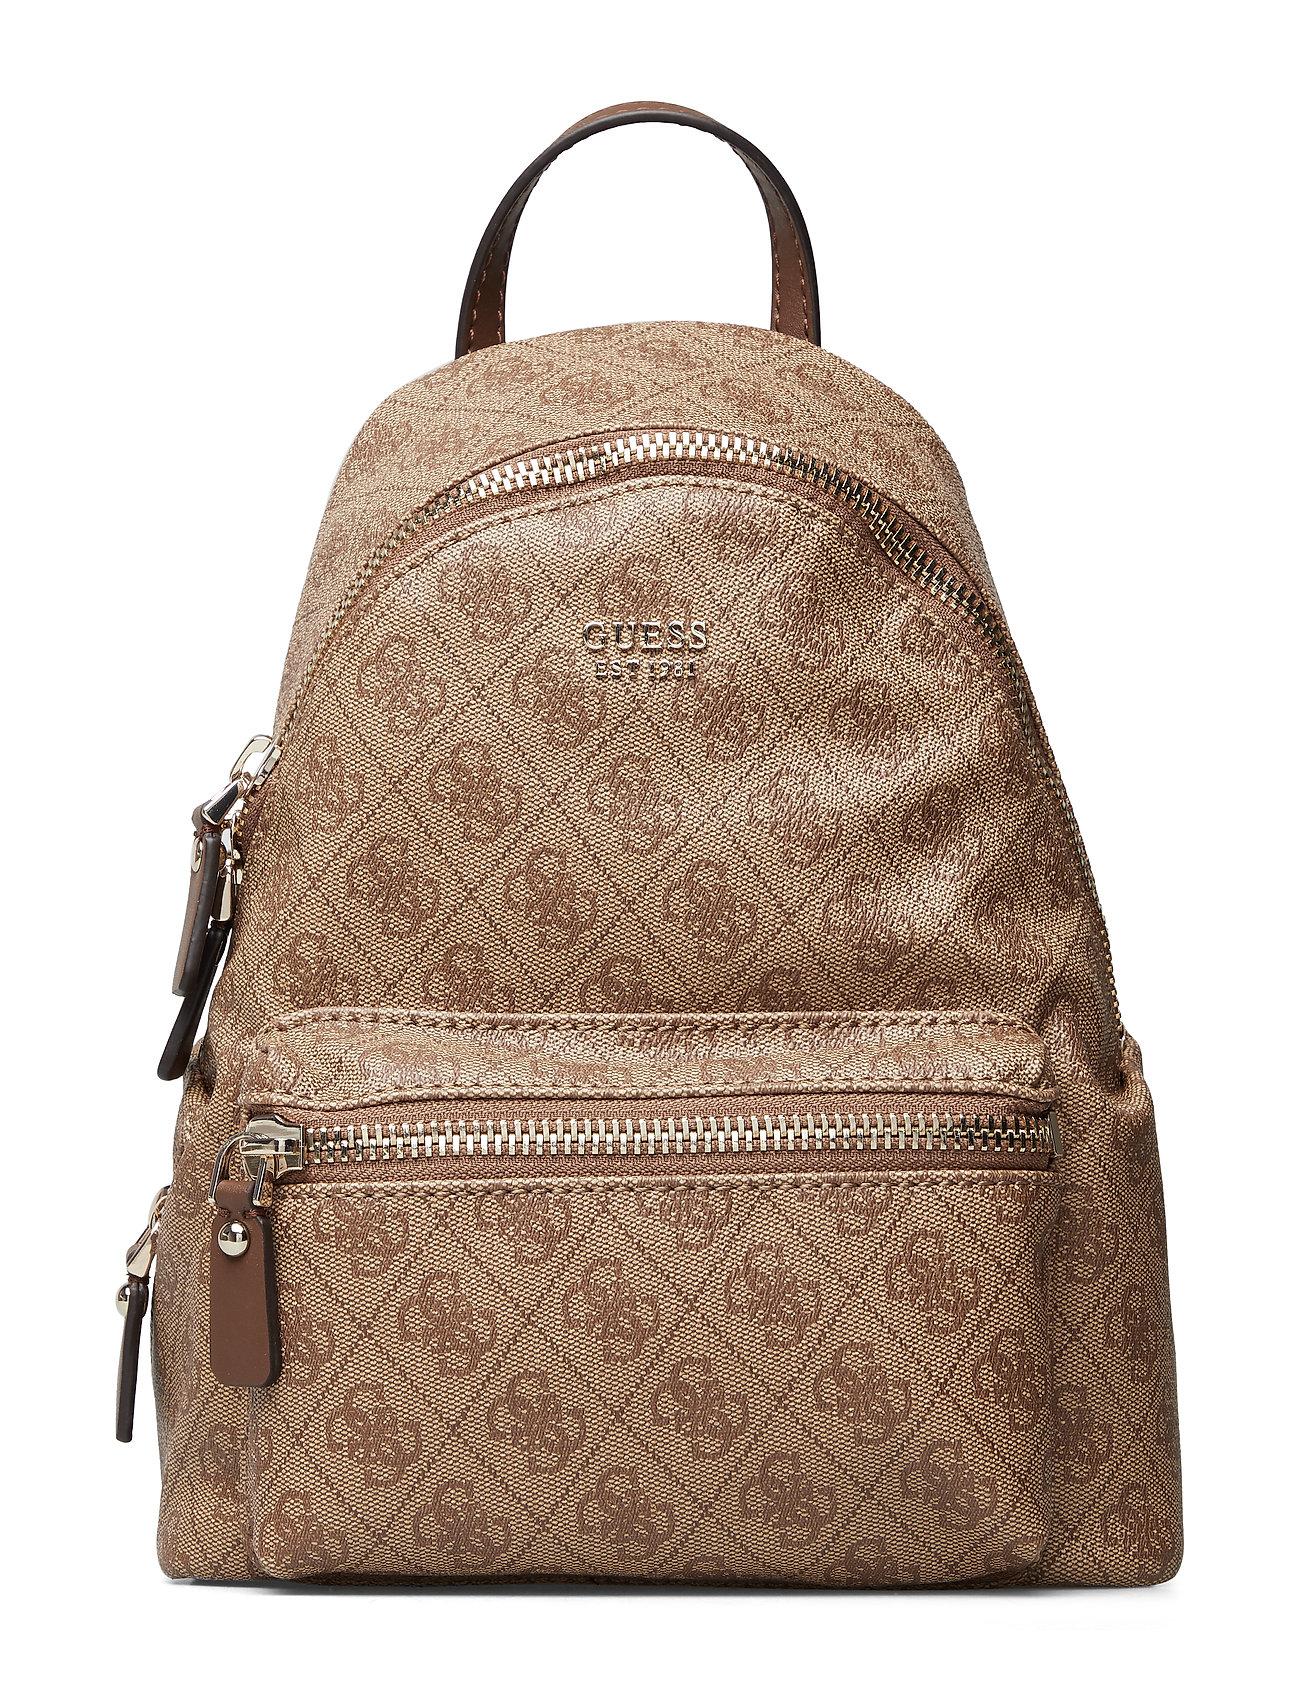 GUESS Leeza Small Backpack Rucksack Tasche Beige GUESS